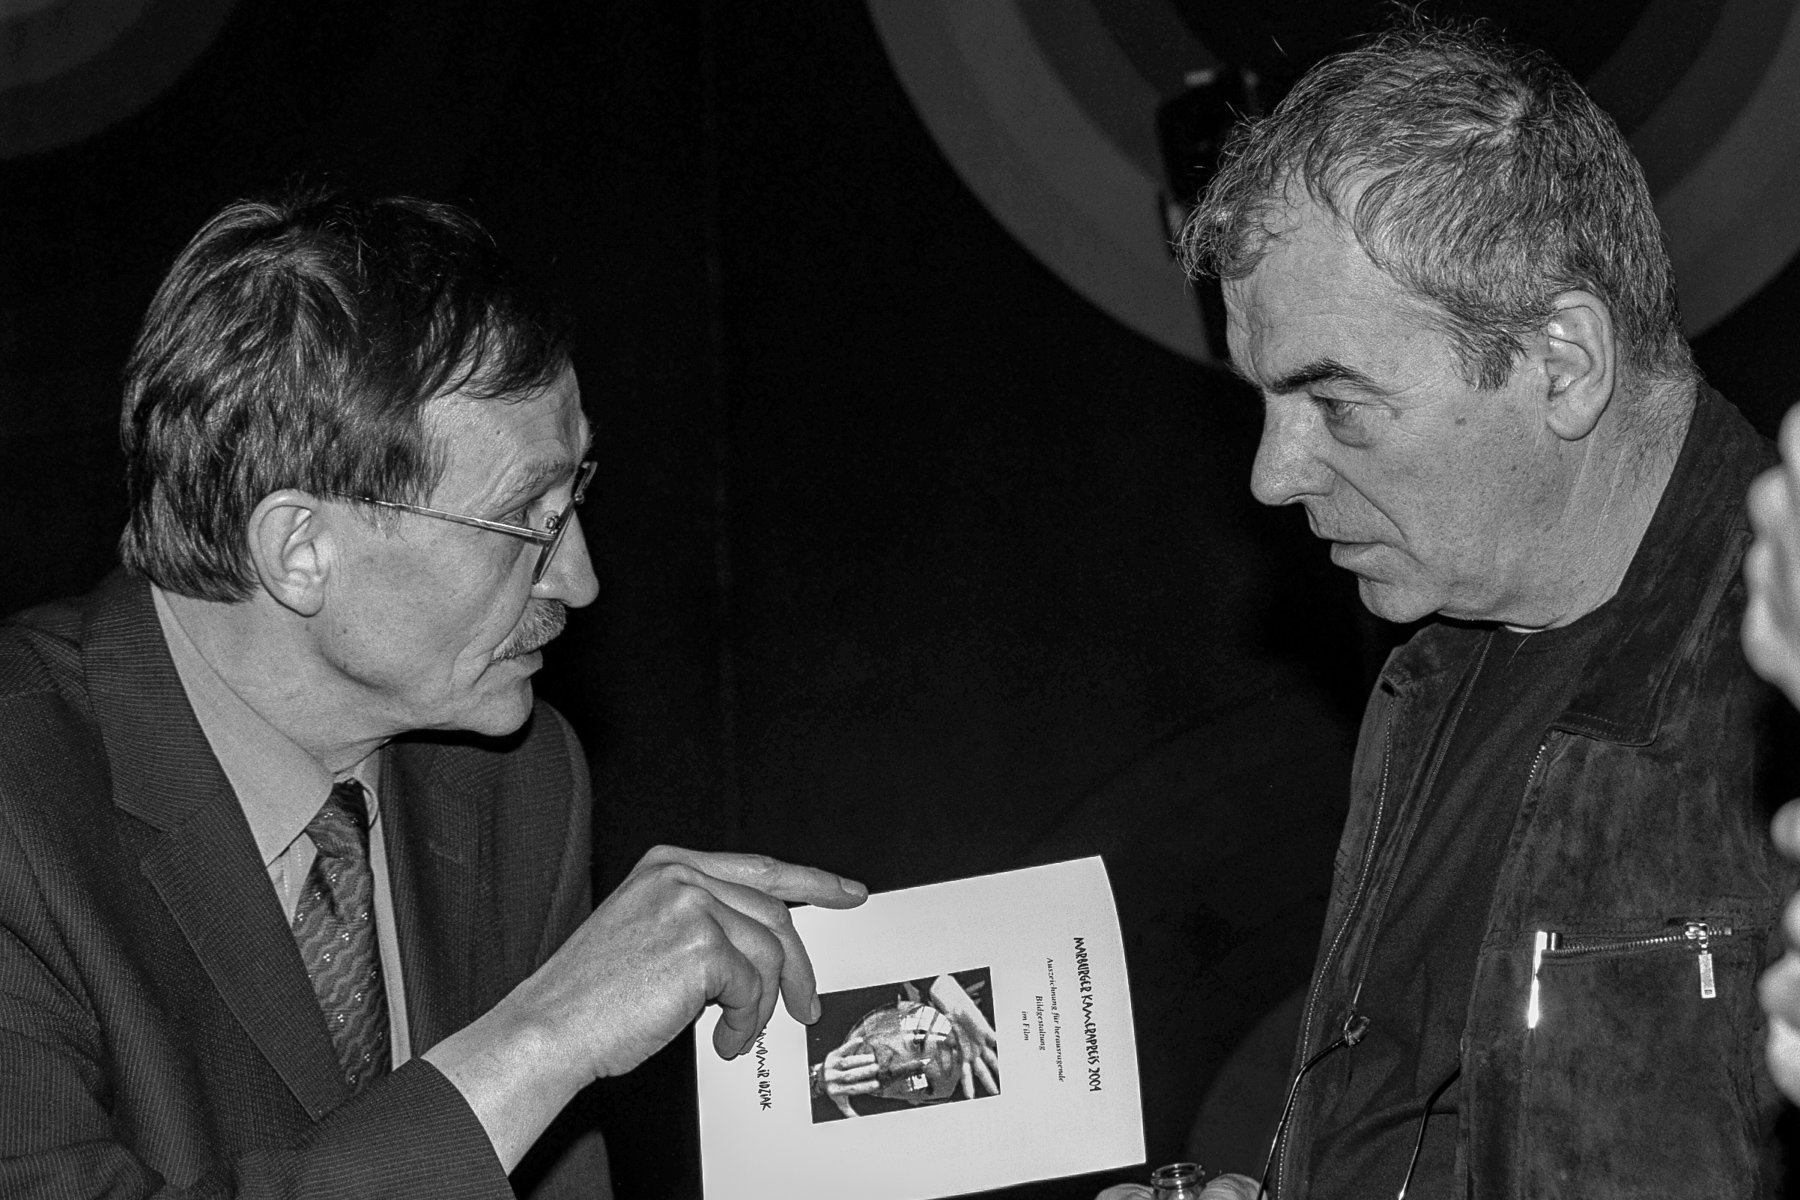 Karl Prümm Slawomir Idziak Marburger Kamerapreis